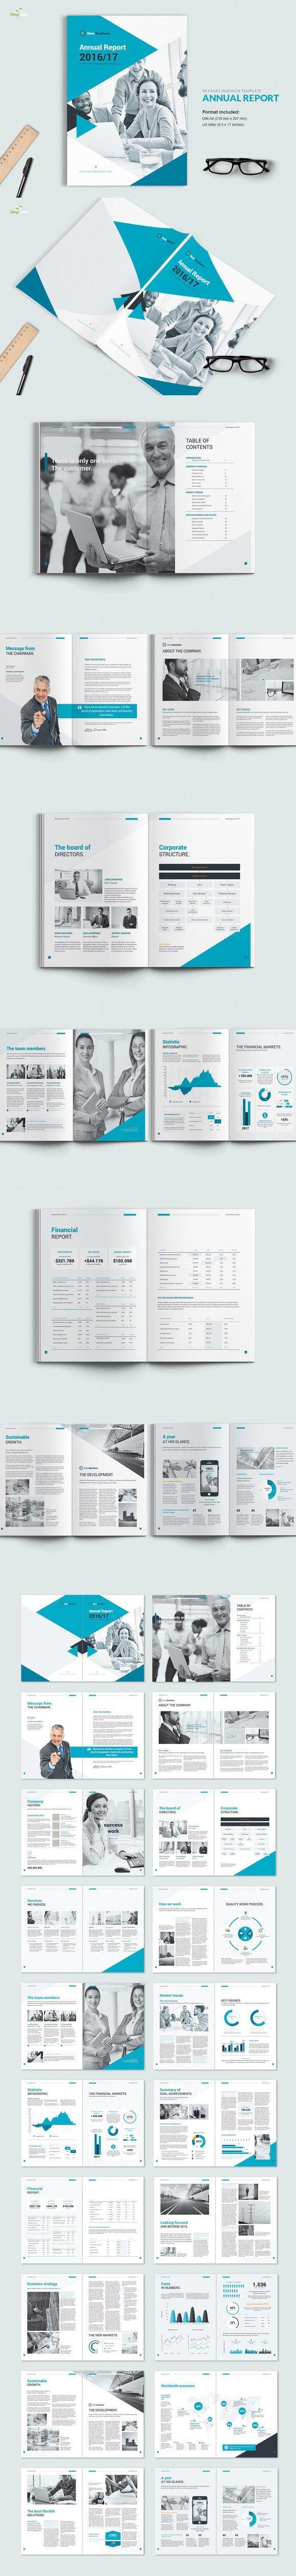 Annual Report 2016. Annual Report Templates. $12.00